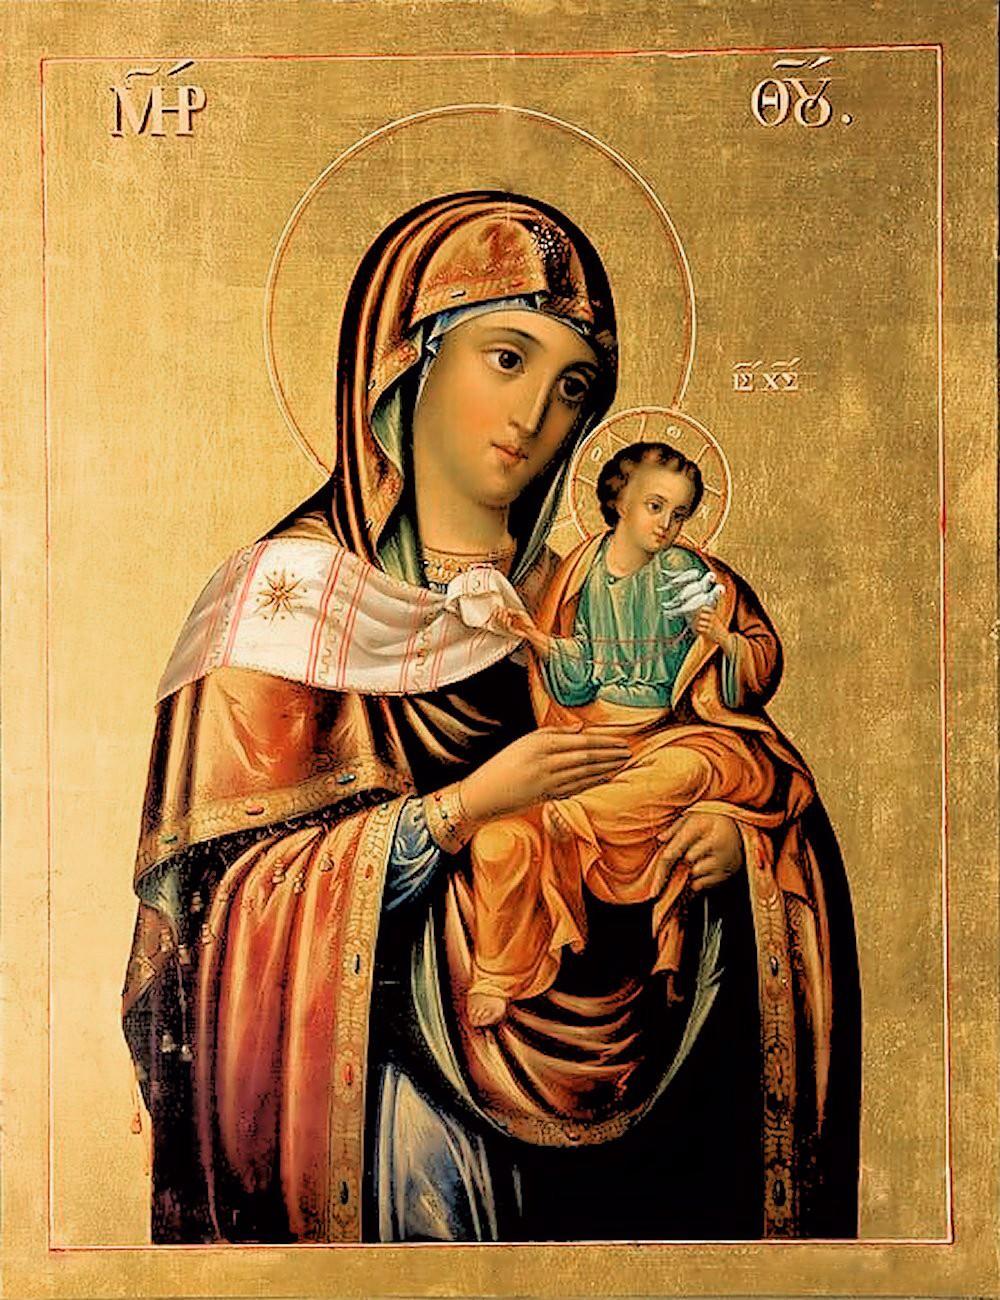 ... Unknown Artist. Mother of God 'of Konevskaya'. 19th century Russian: https://02varvara.wordpress.com/2013/05/08/russian-icons-at-knights...